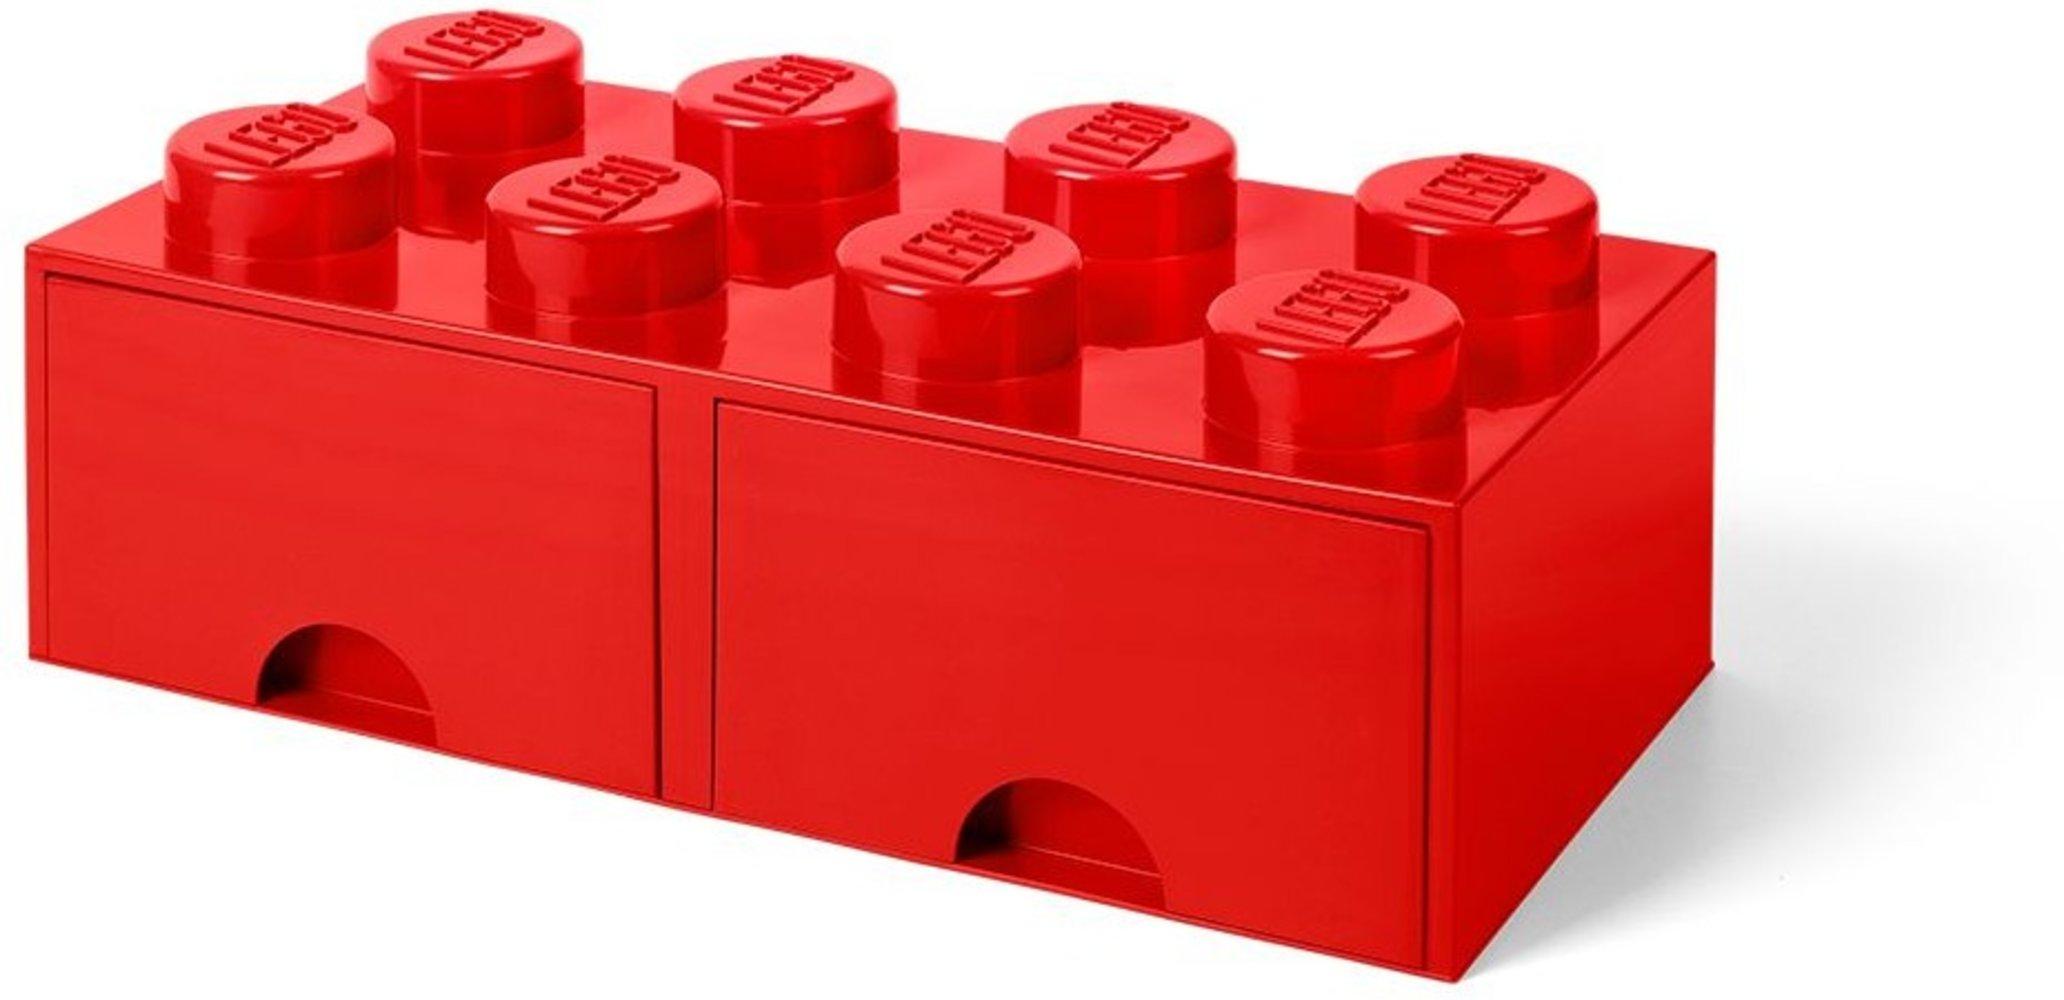 Storage Brick Drawer (8-Stud Red)